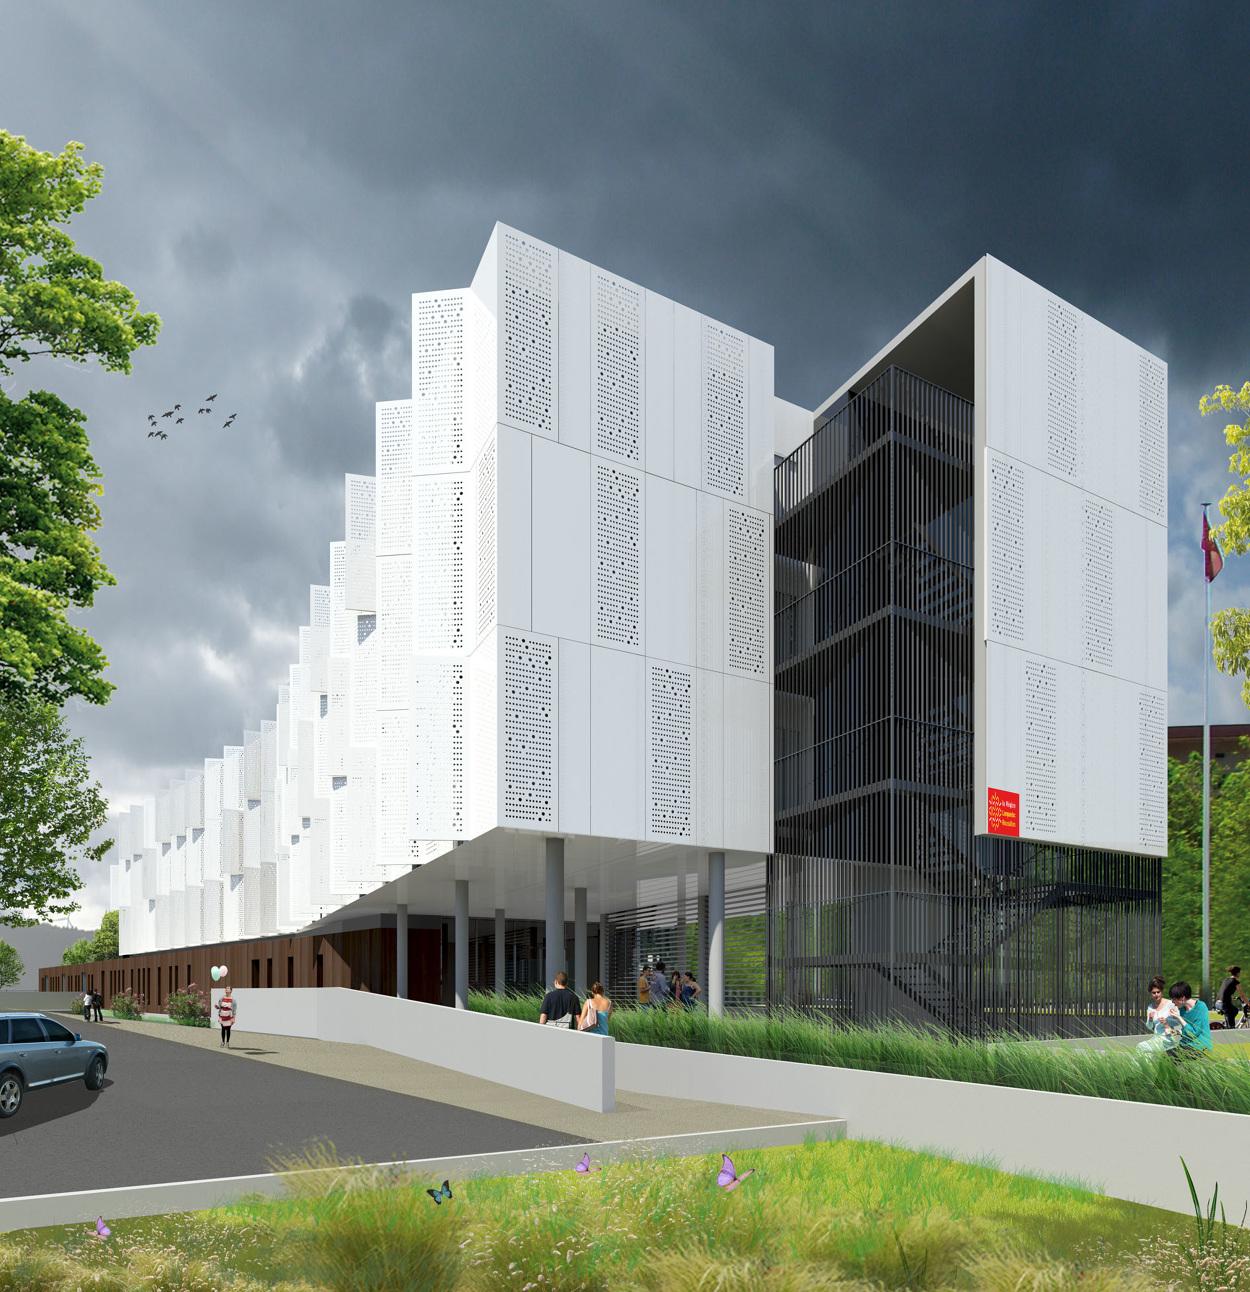 Internat philippe lamour grenier thomas architecte for Architecte lattes